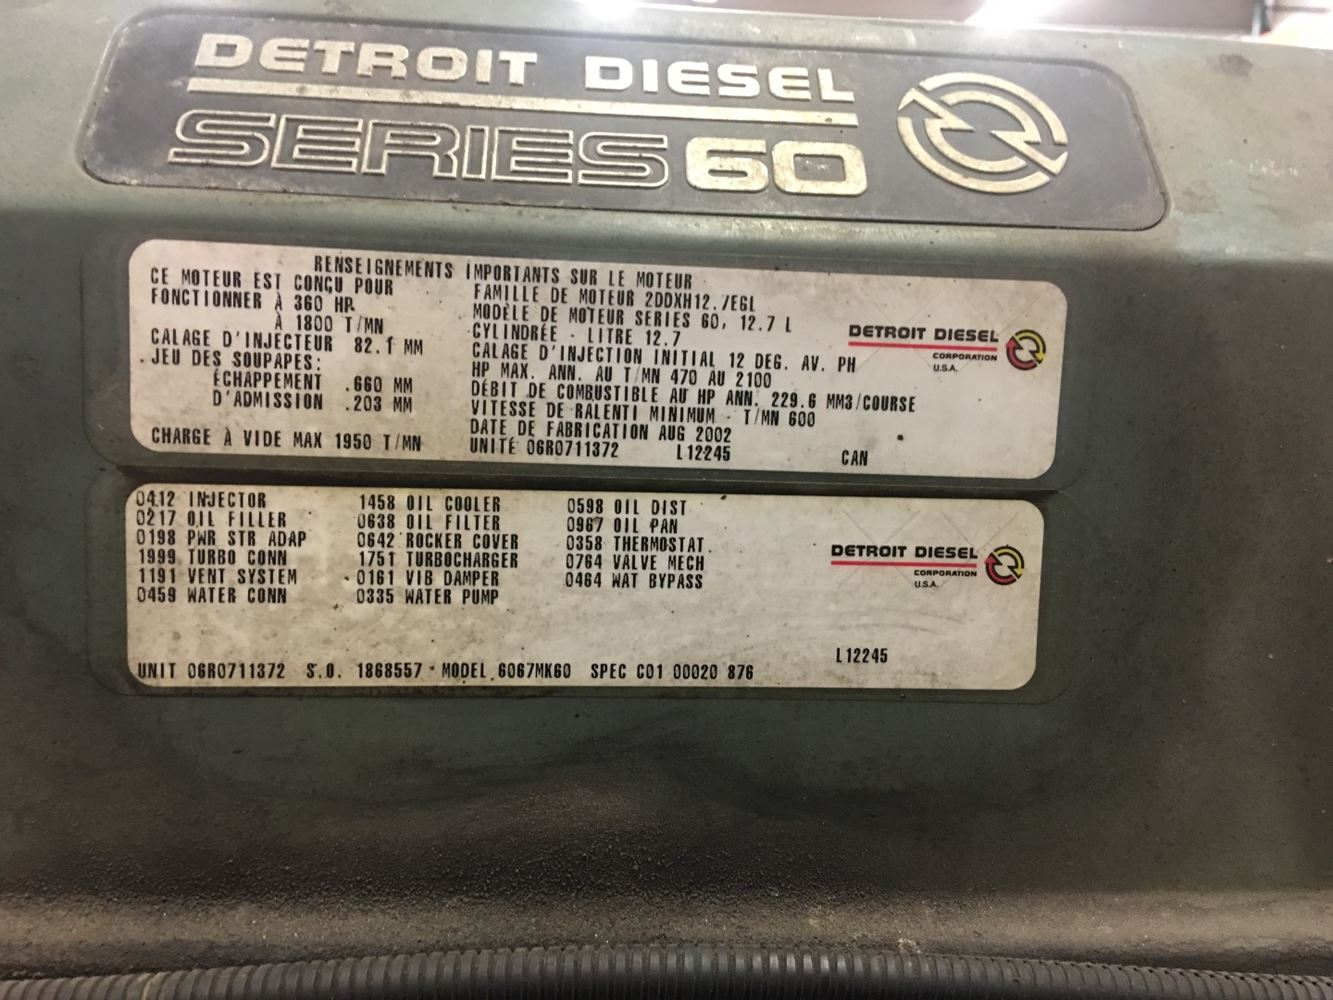 2002 Detroit Series 60 12 7L DDEC IV (Stock #227765)